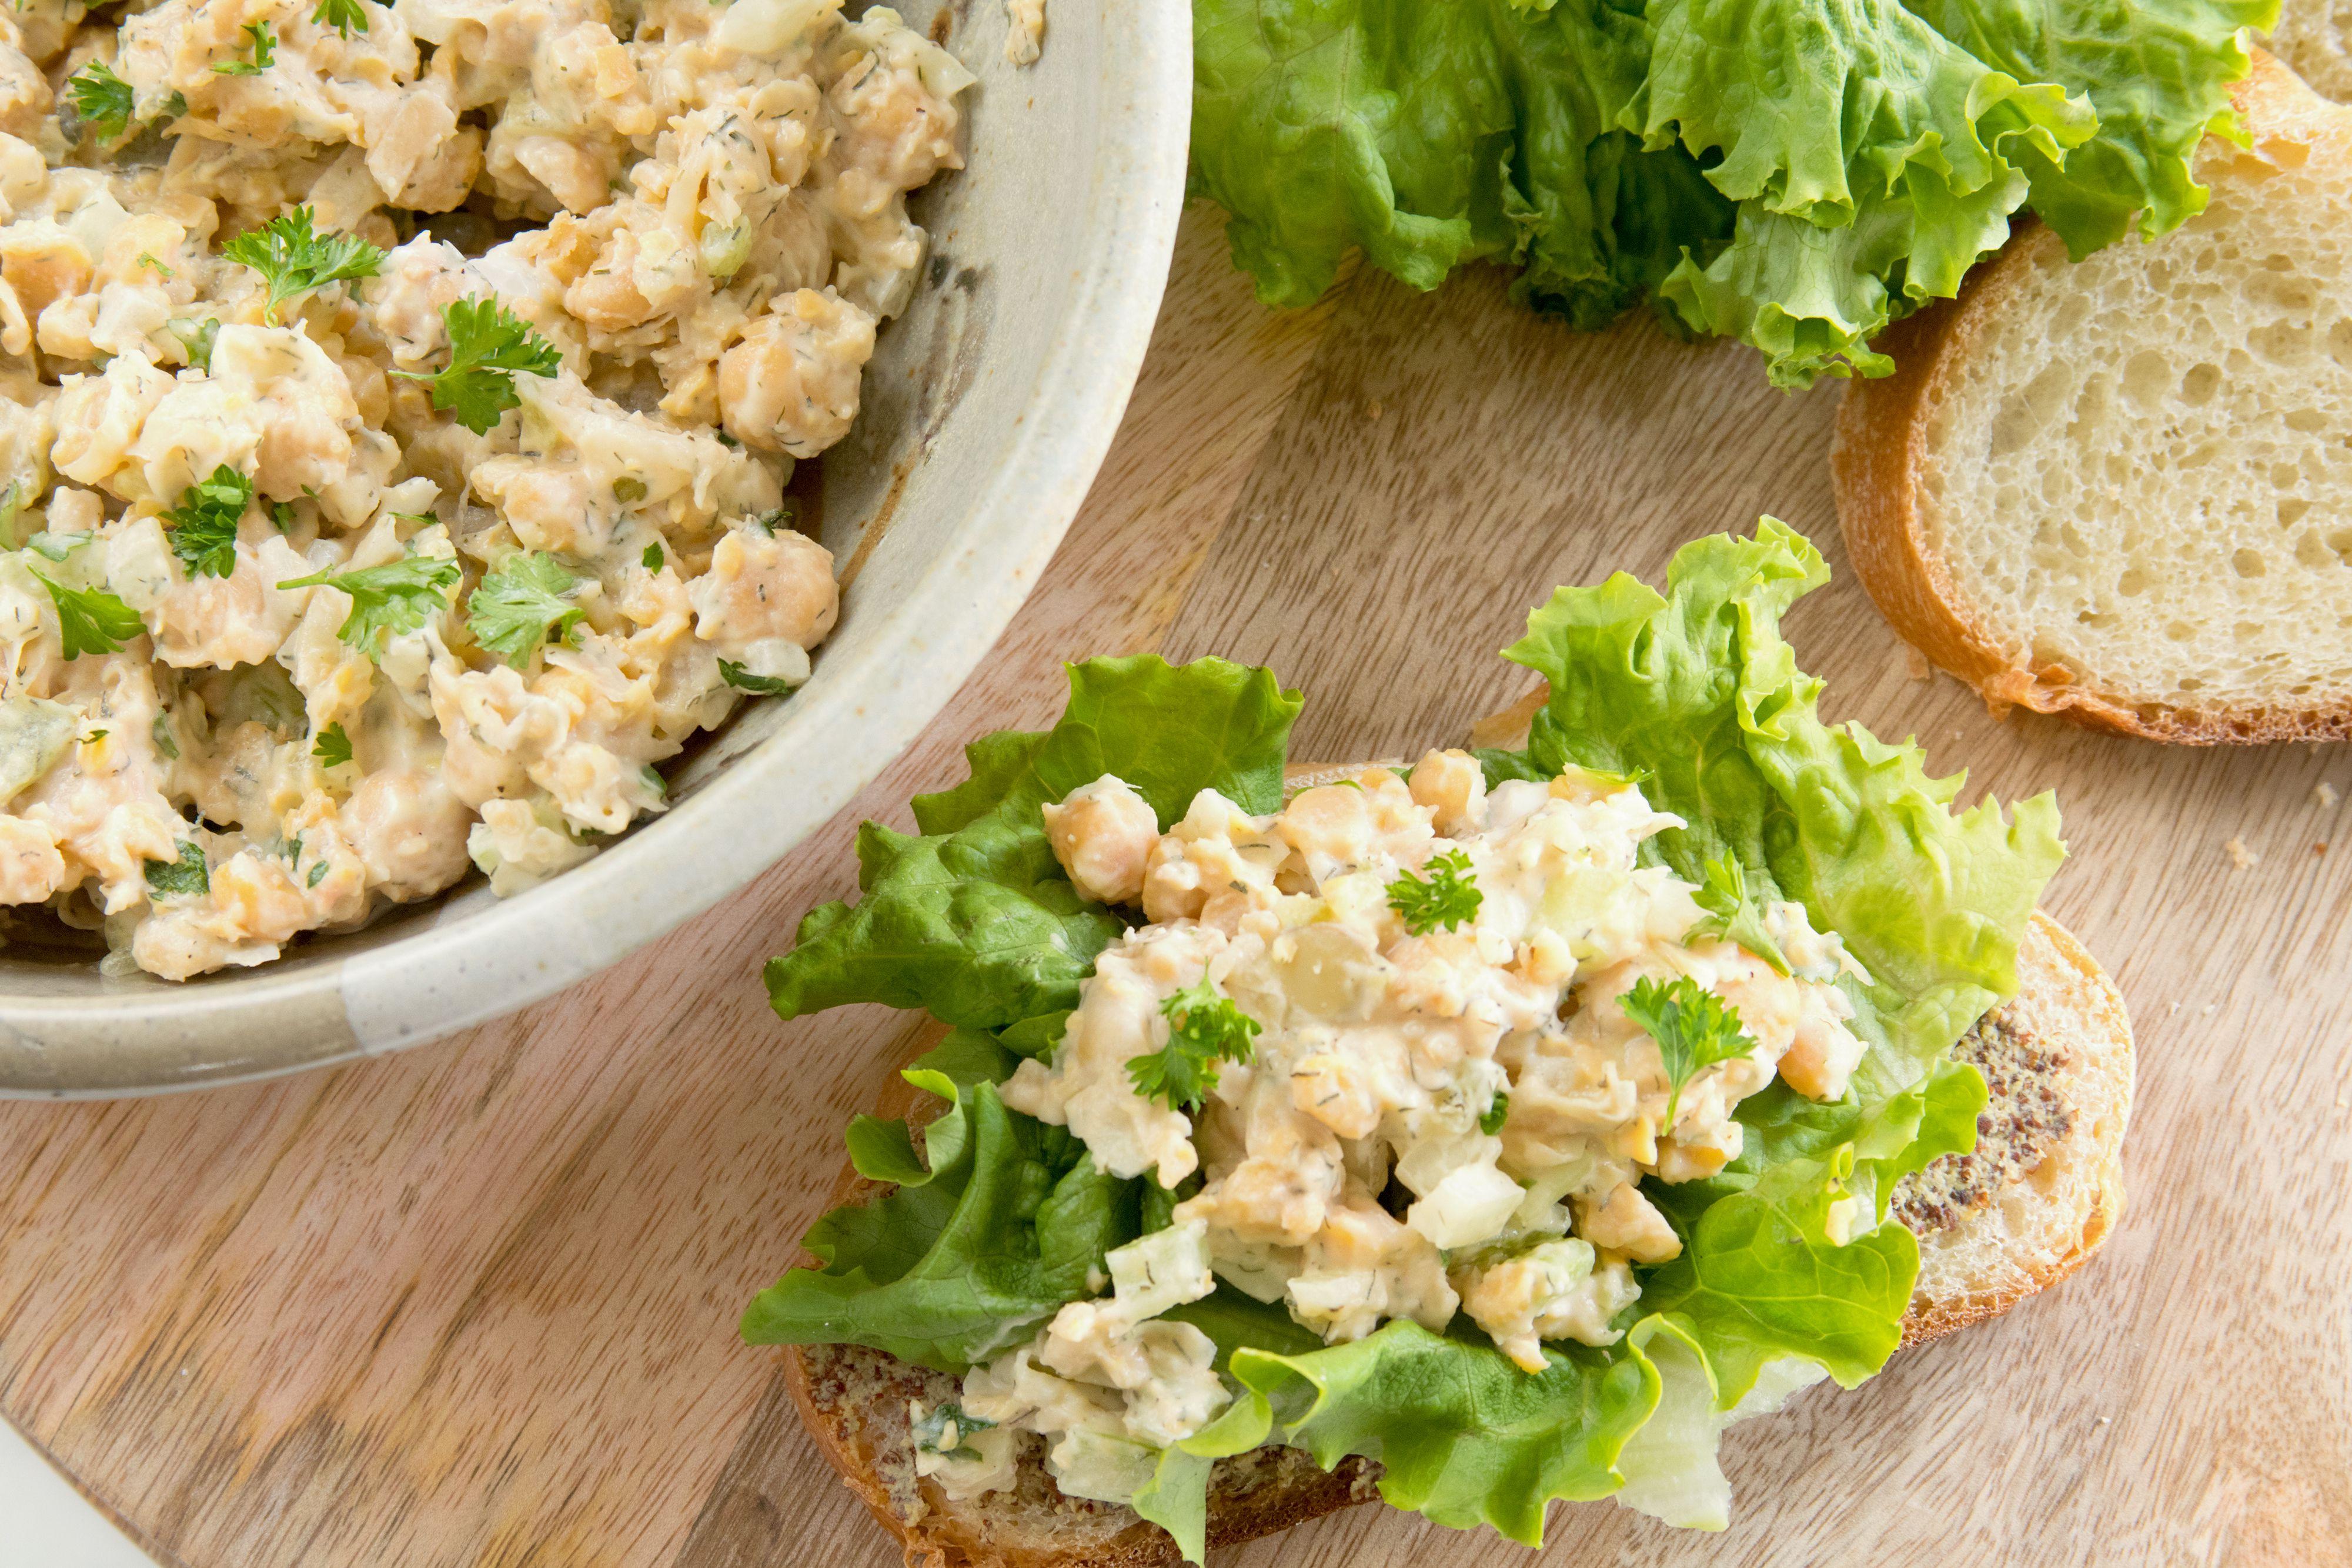 This Mock Tuna Salad Recipe Is a Vegan Delight